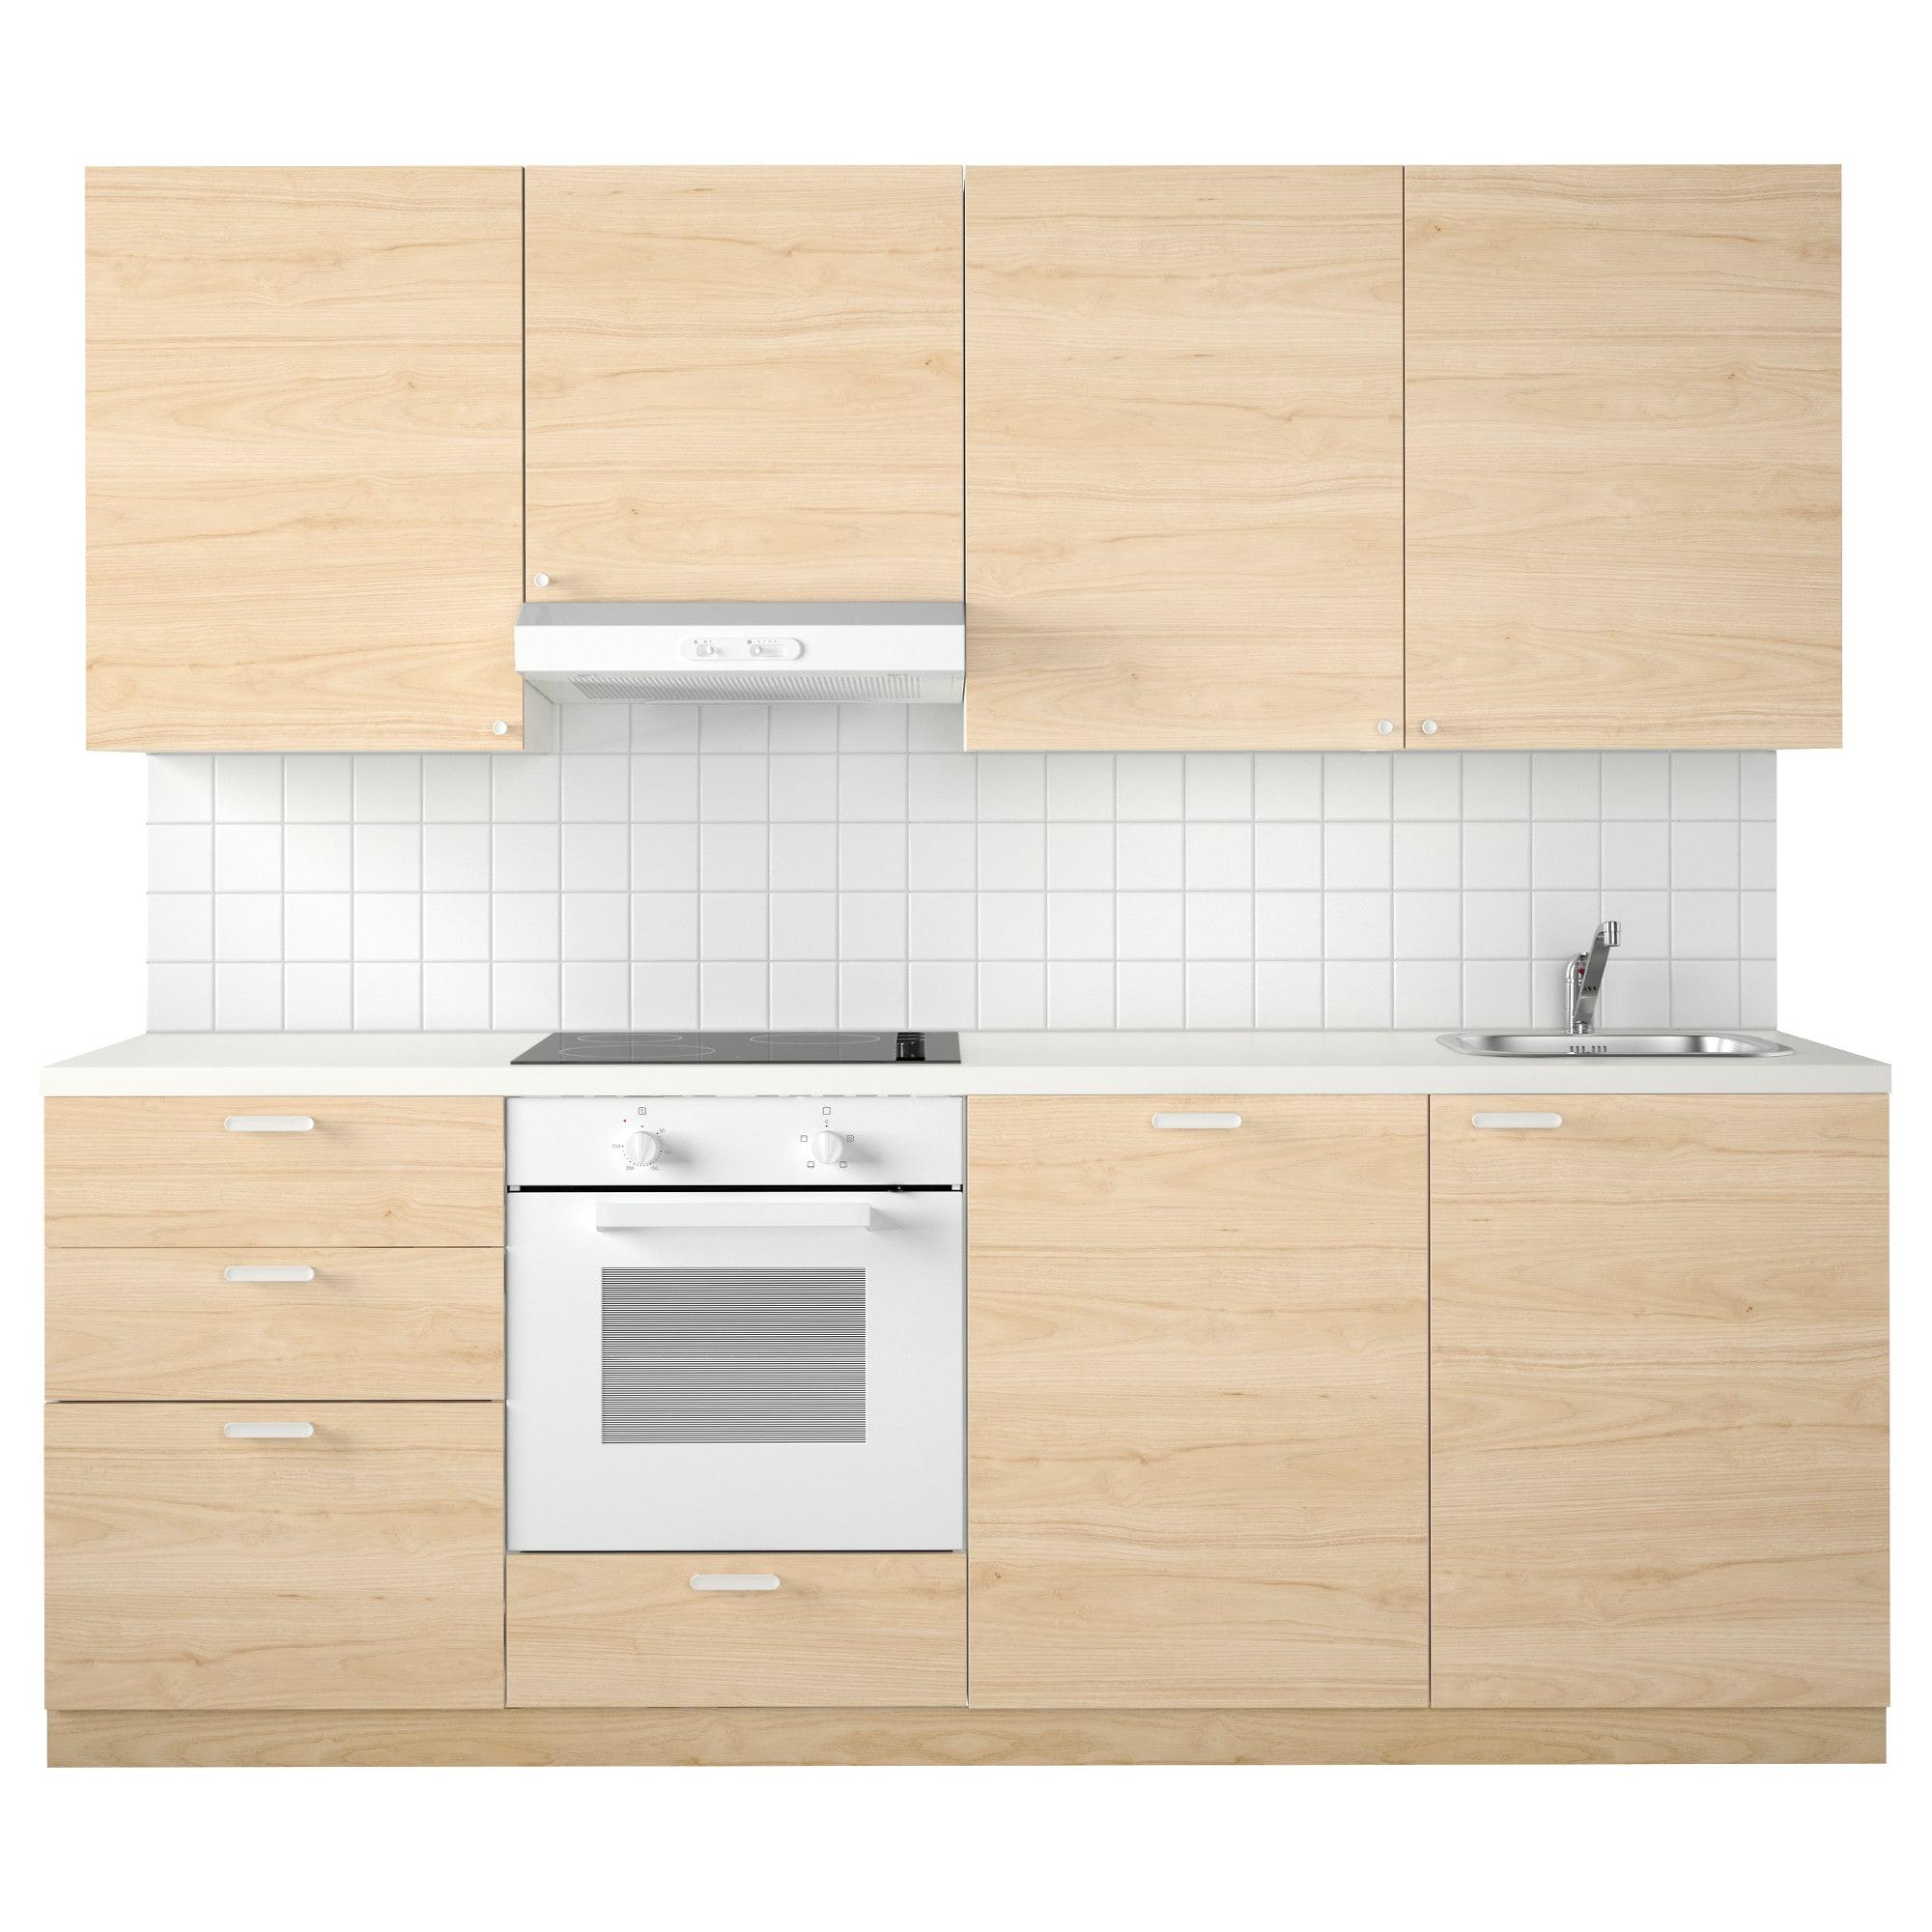 Ikea Furniture And Home Furnishings Ikea Kuchenideen Metod Kuche Kochnische Ikea